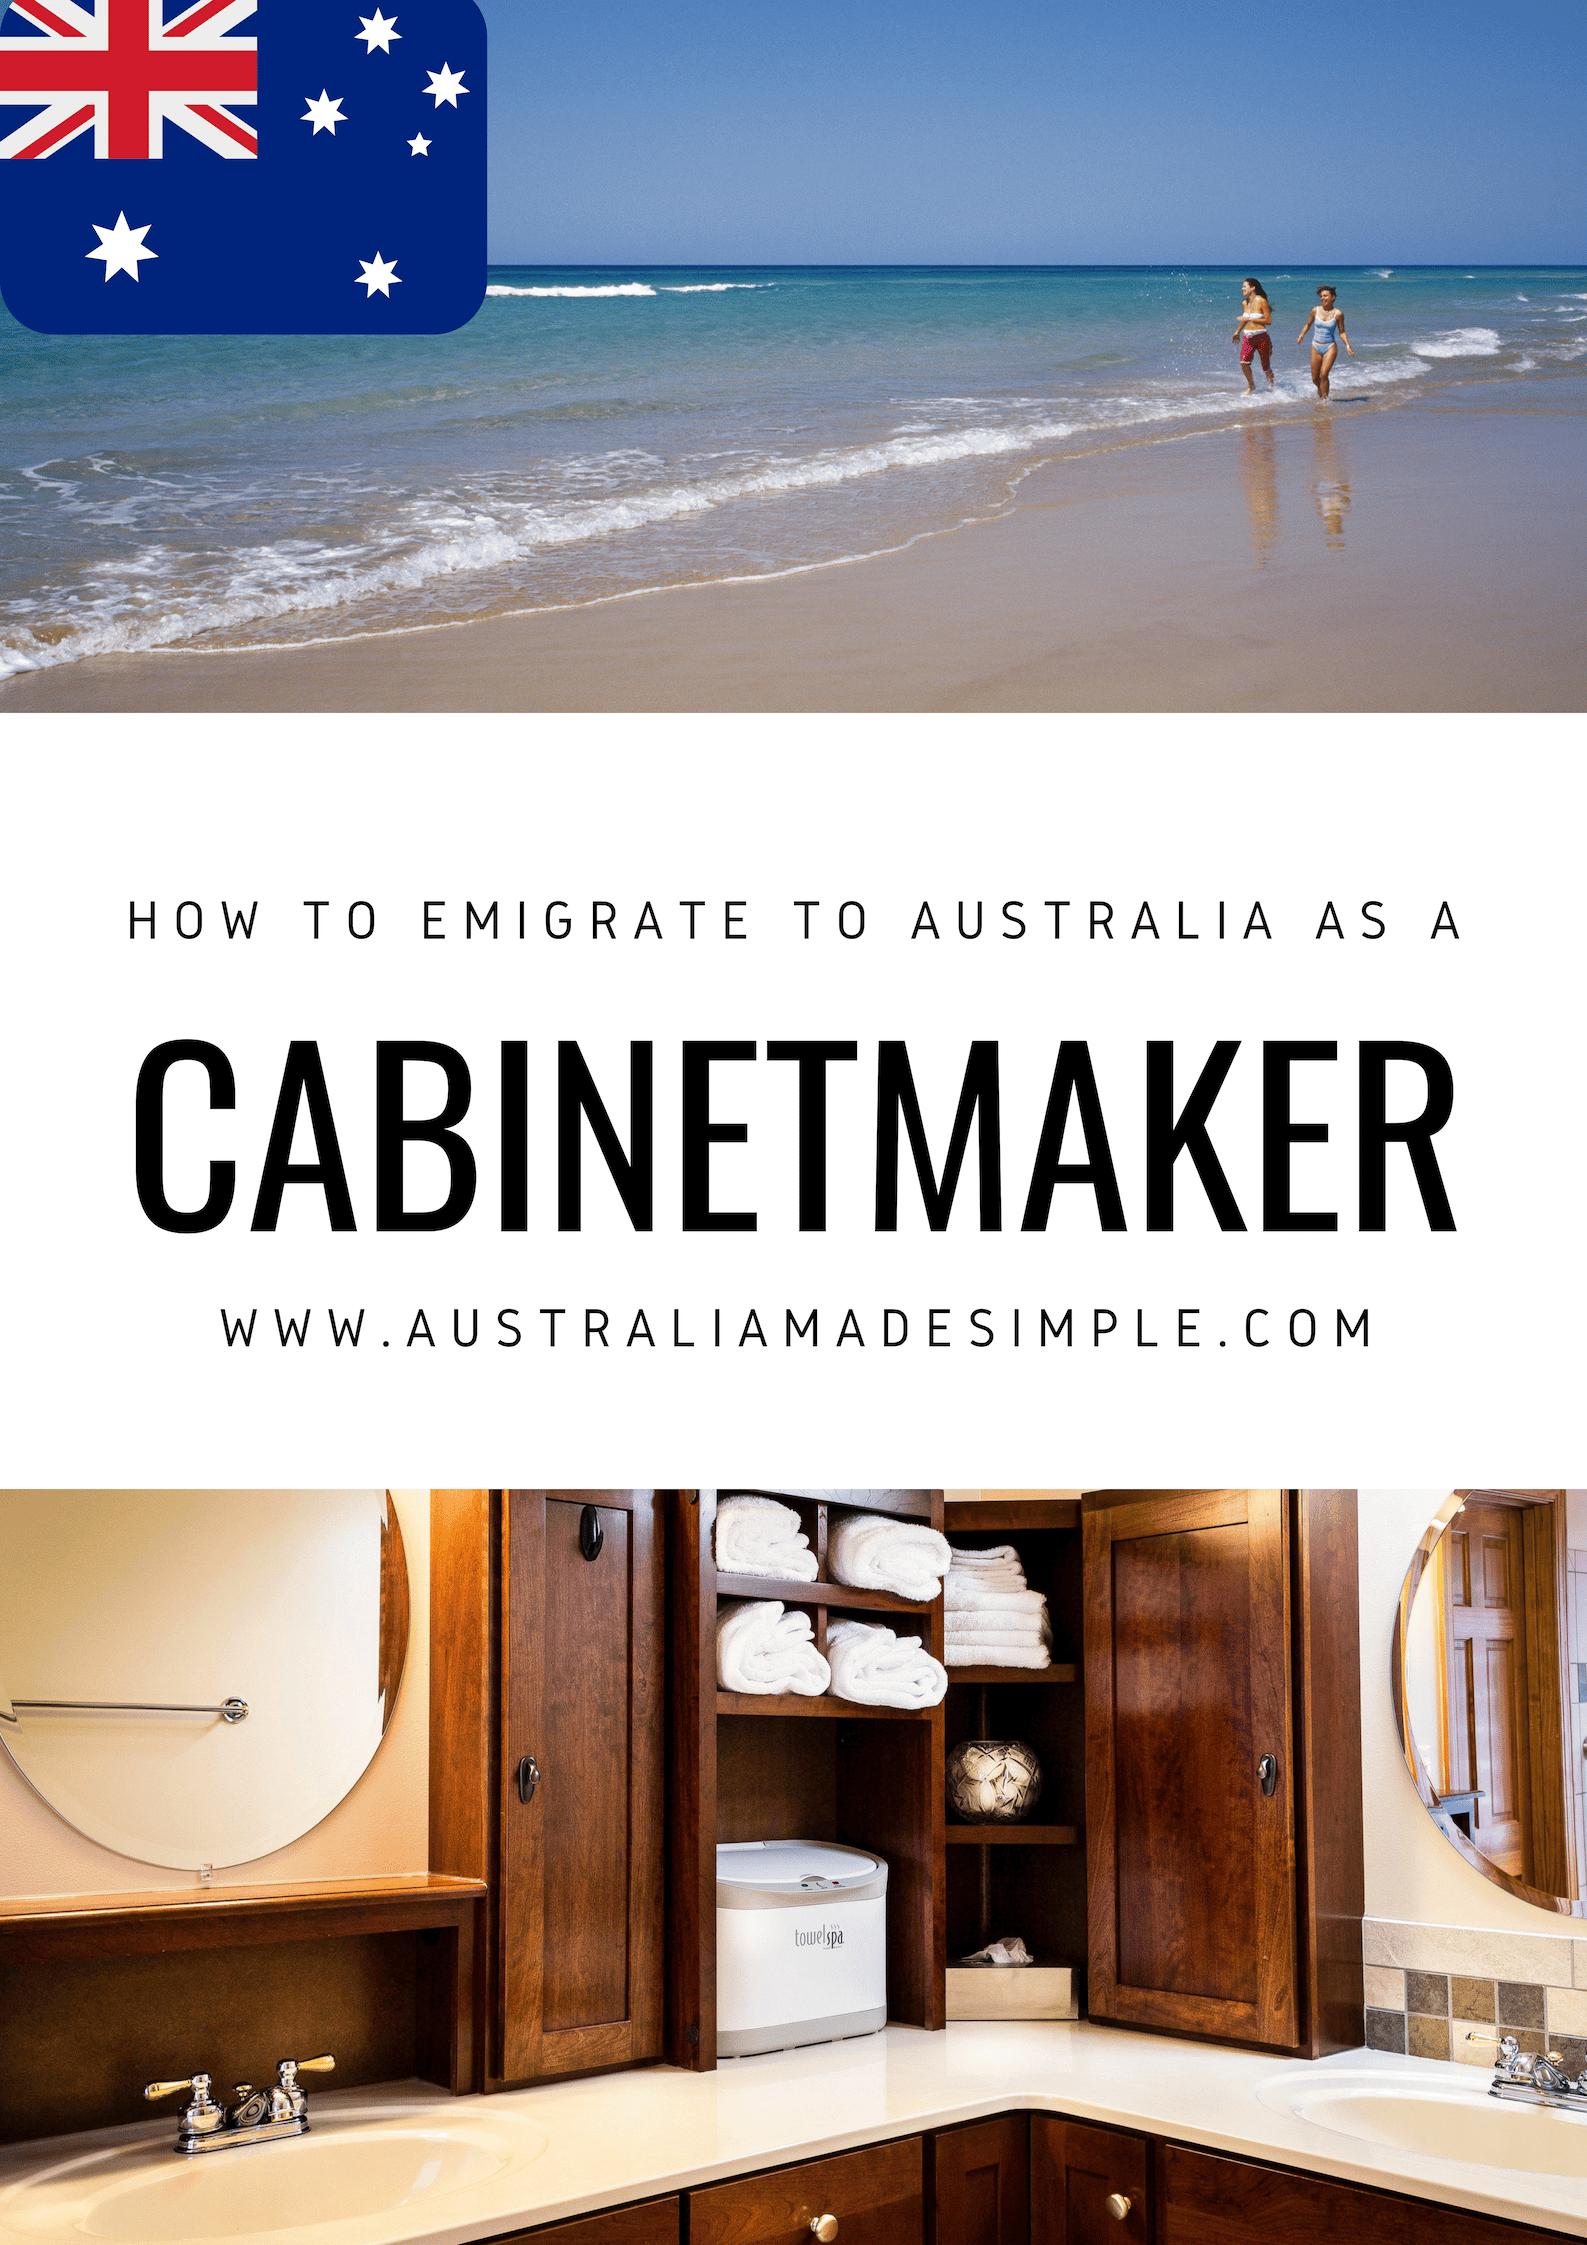 Tremendous Migrate To Australia As A Cabinetmaker Ultimate Guide To Download Free Architecture Designs Pendunizatbritishbridgeorg